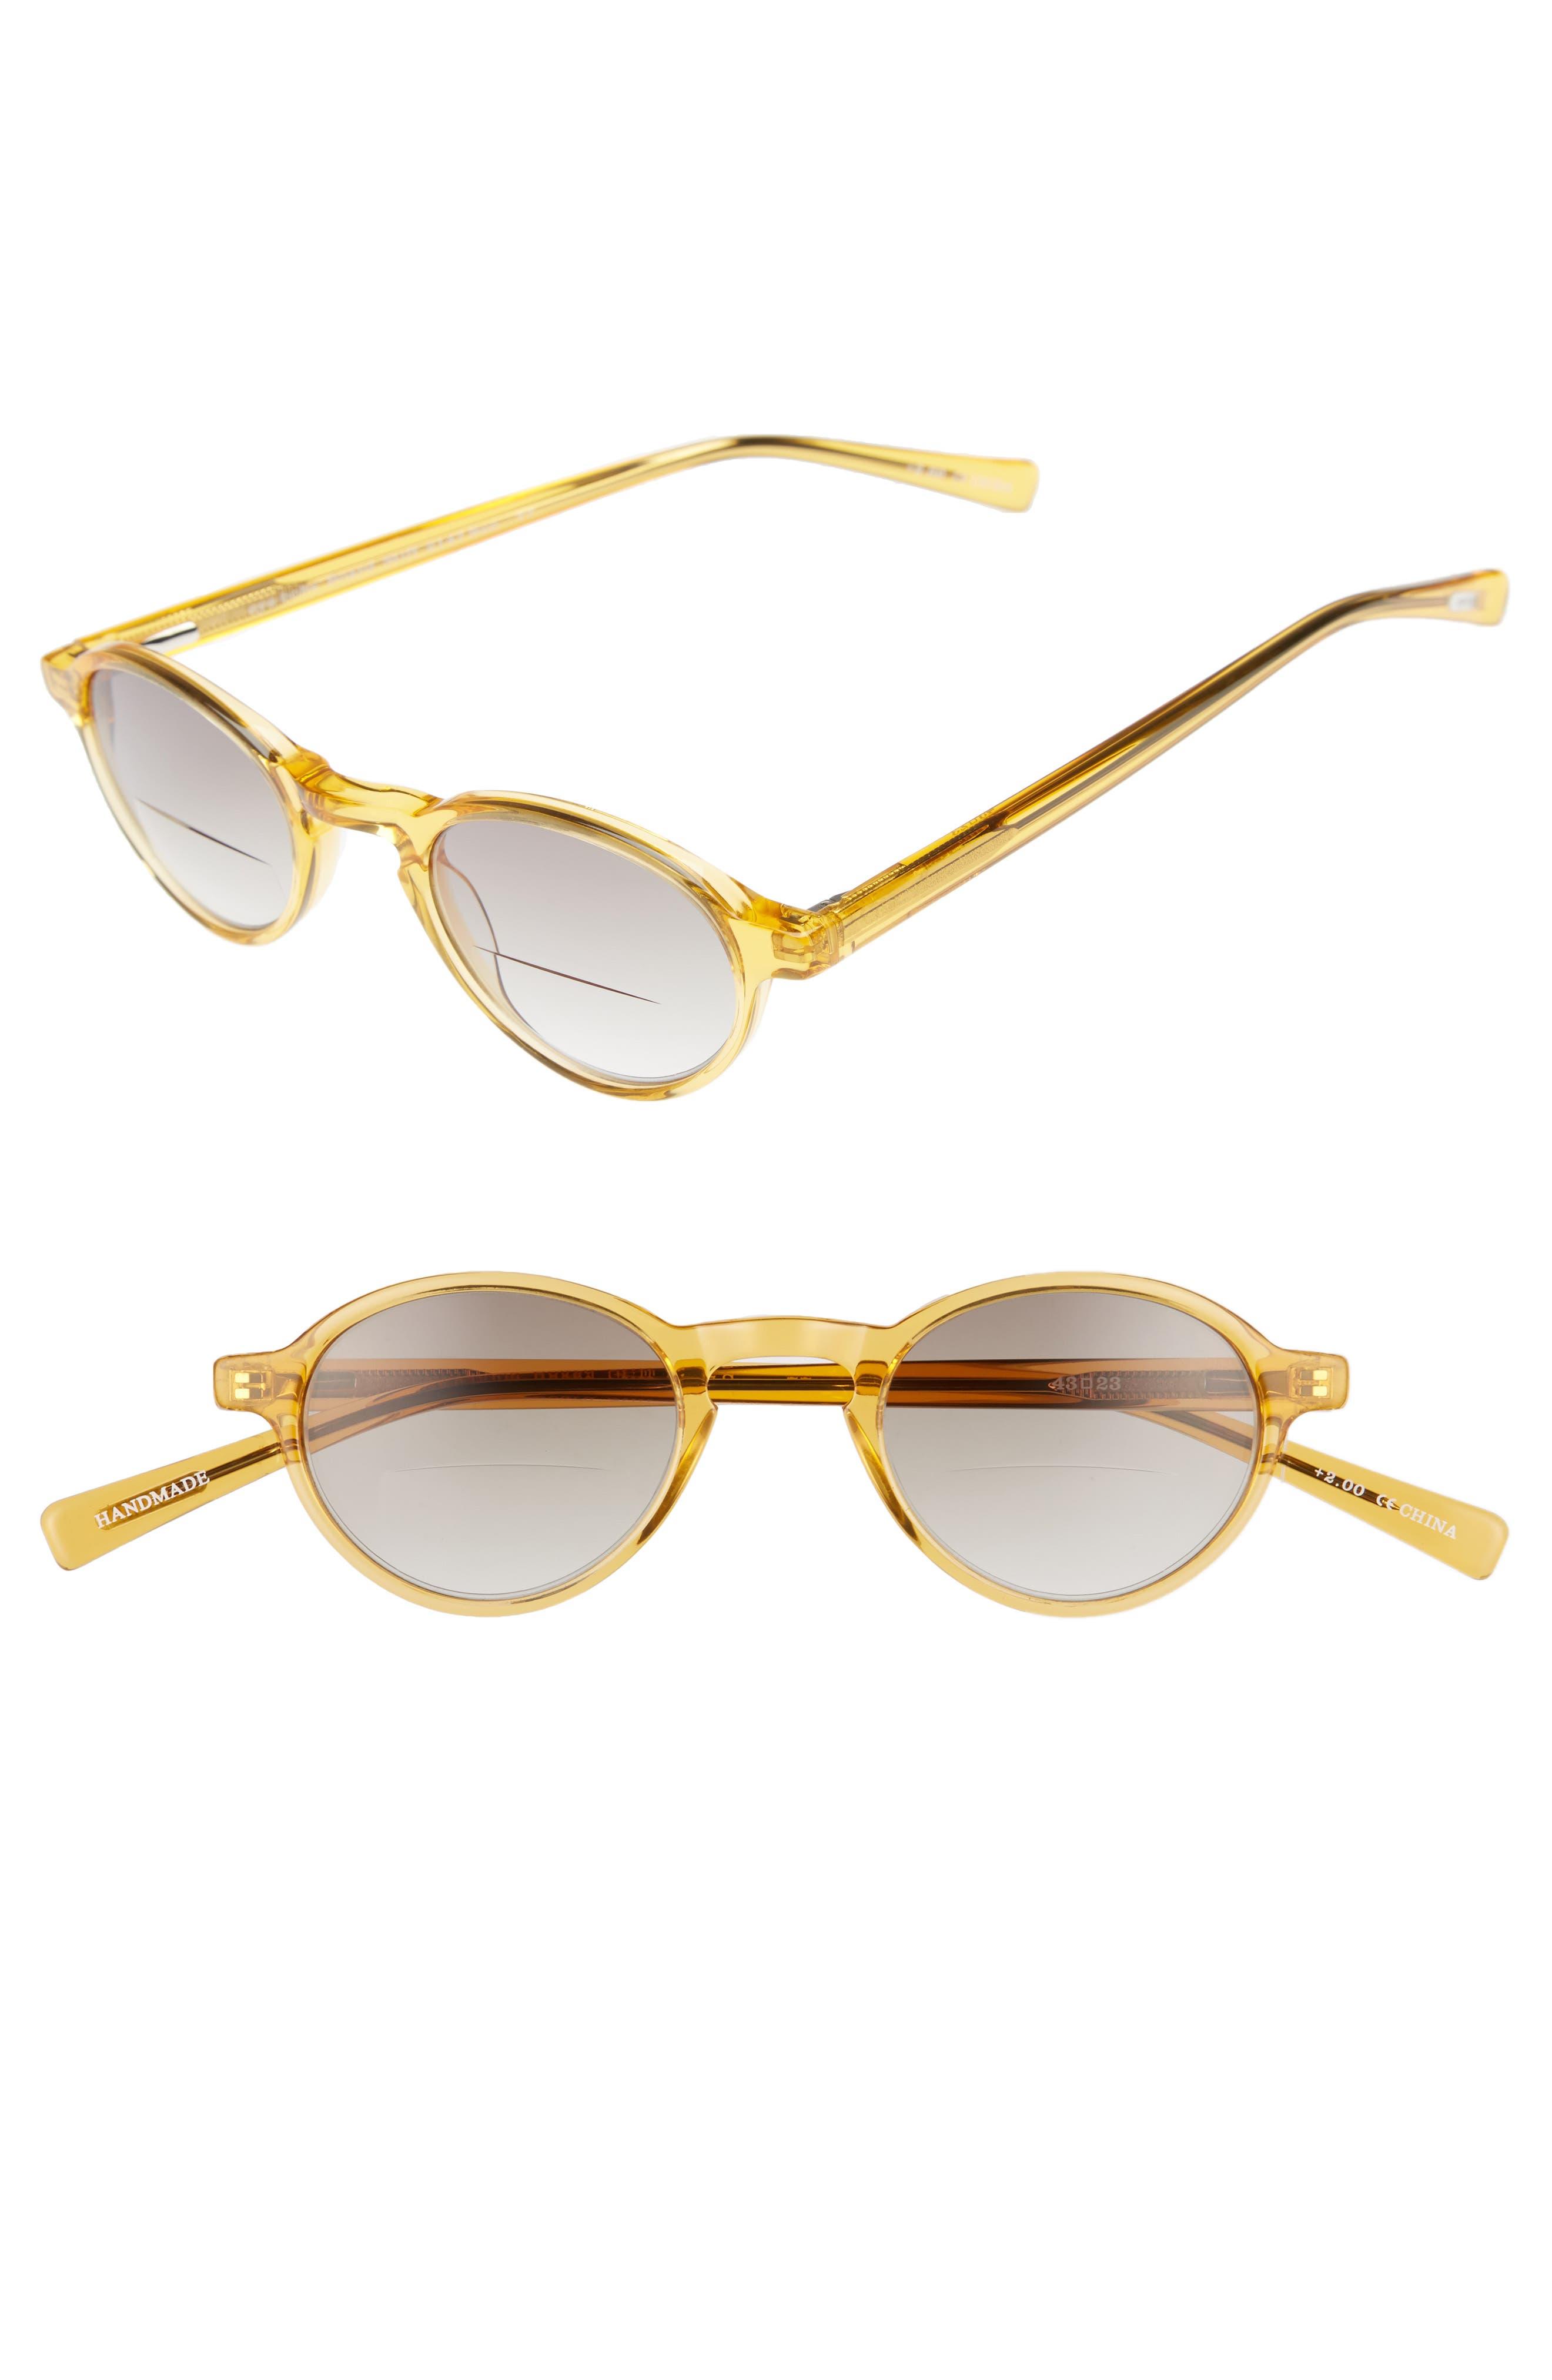 EYEBOBS Board Stiff 43mm Reading Sunglasses